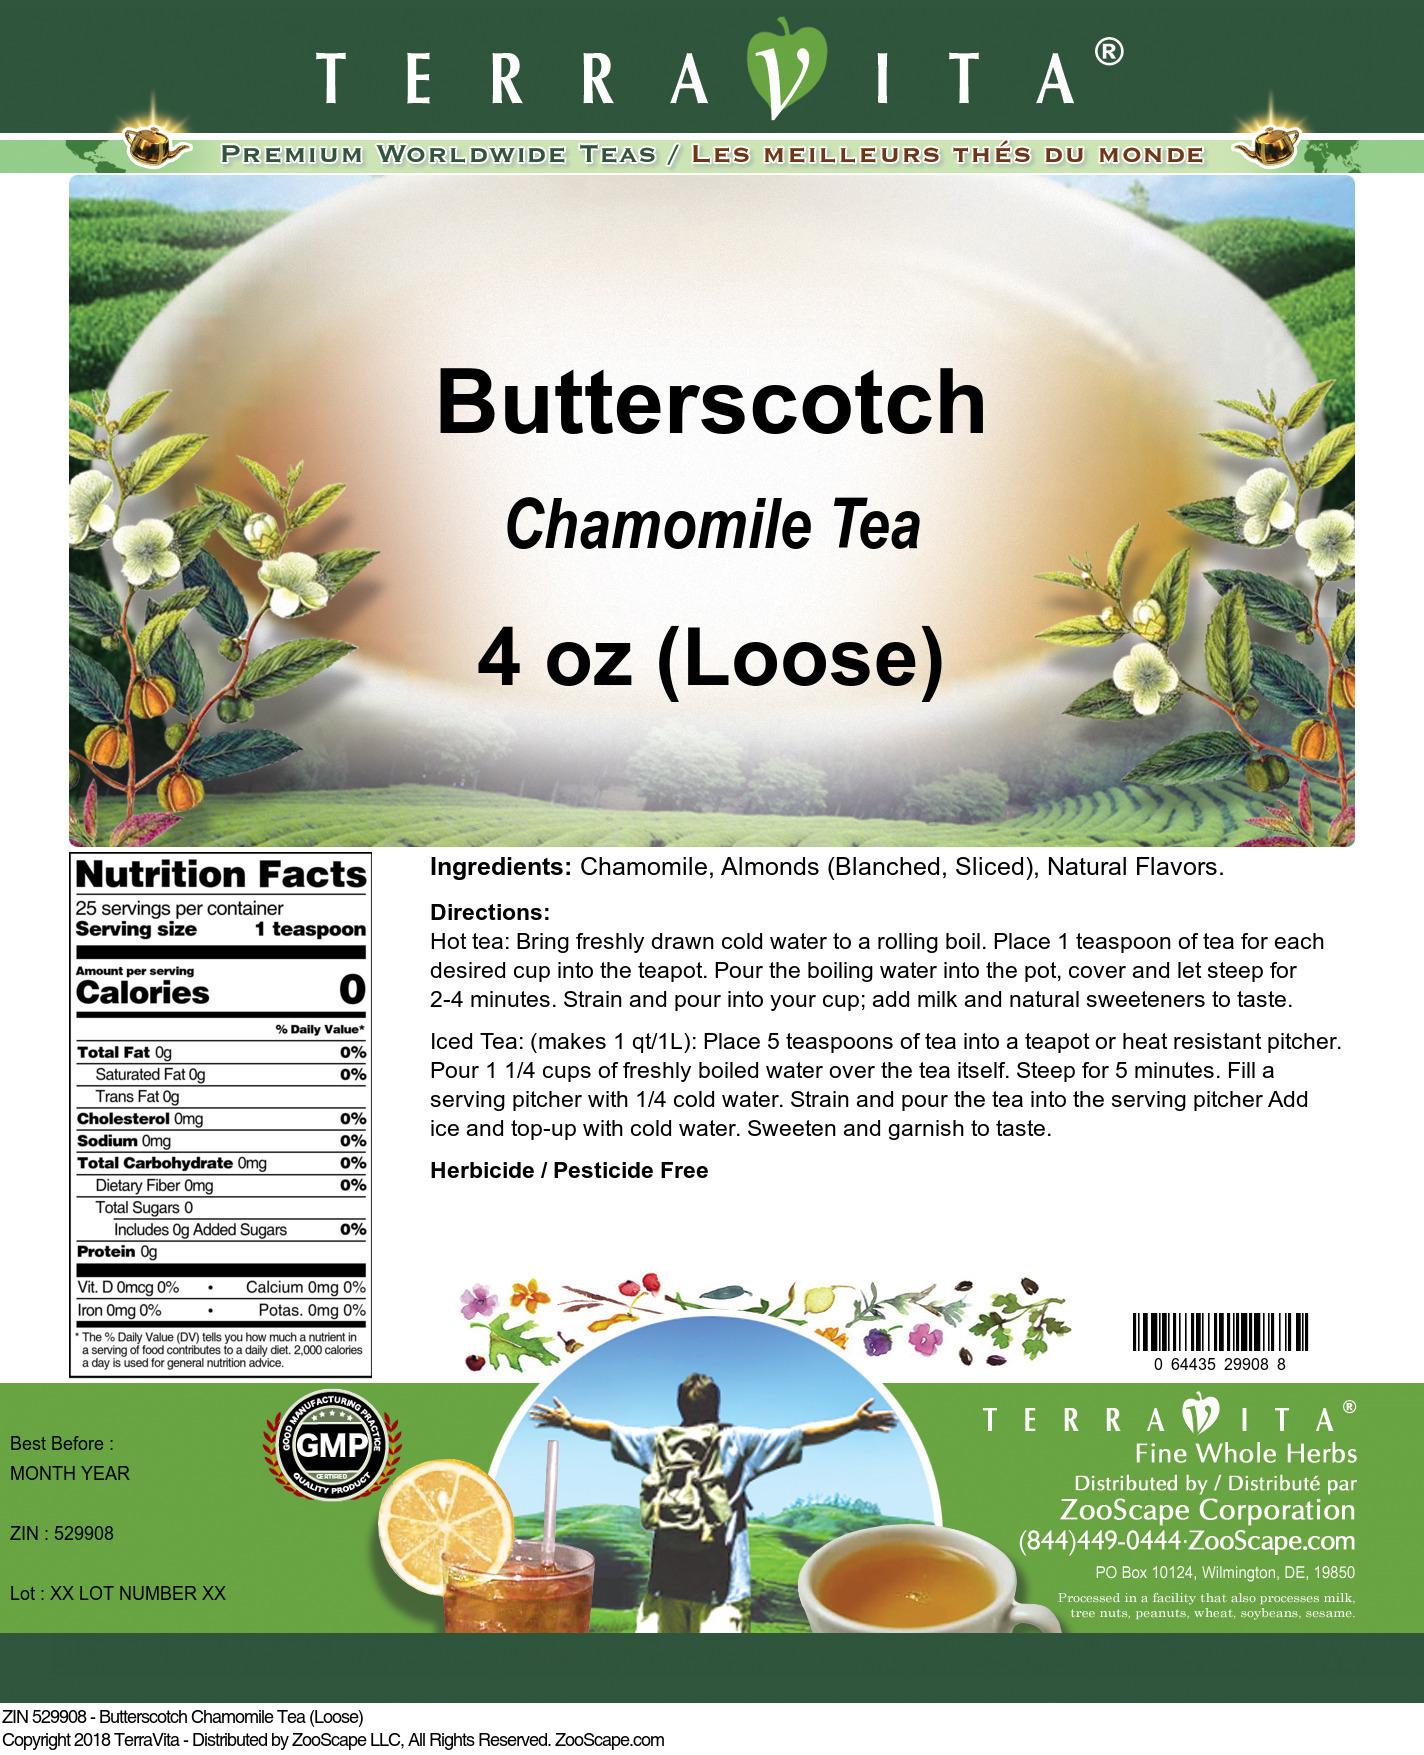 Butterscotch Chamomile Tea